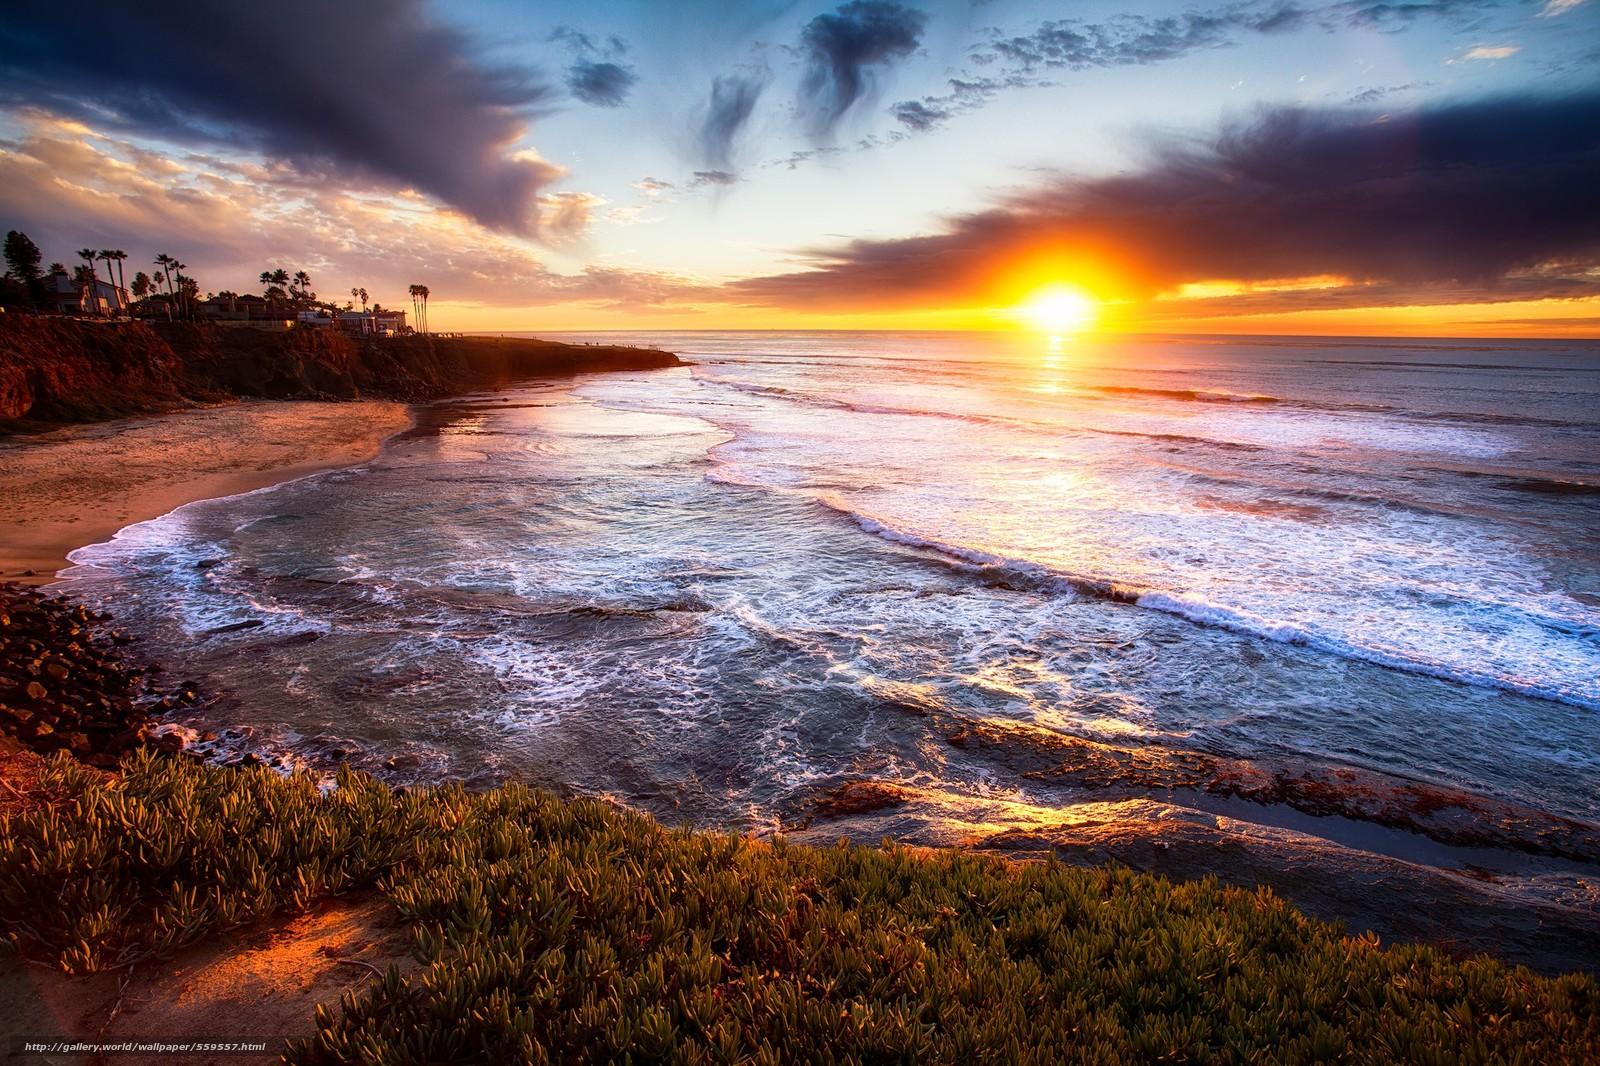 Download Wallpaper San Diego California Sunset Landscape Free Desktop Wallpaper In The ...